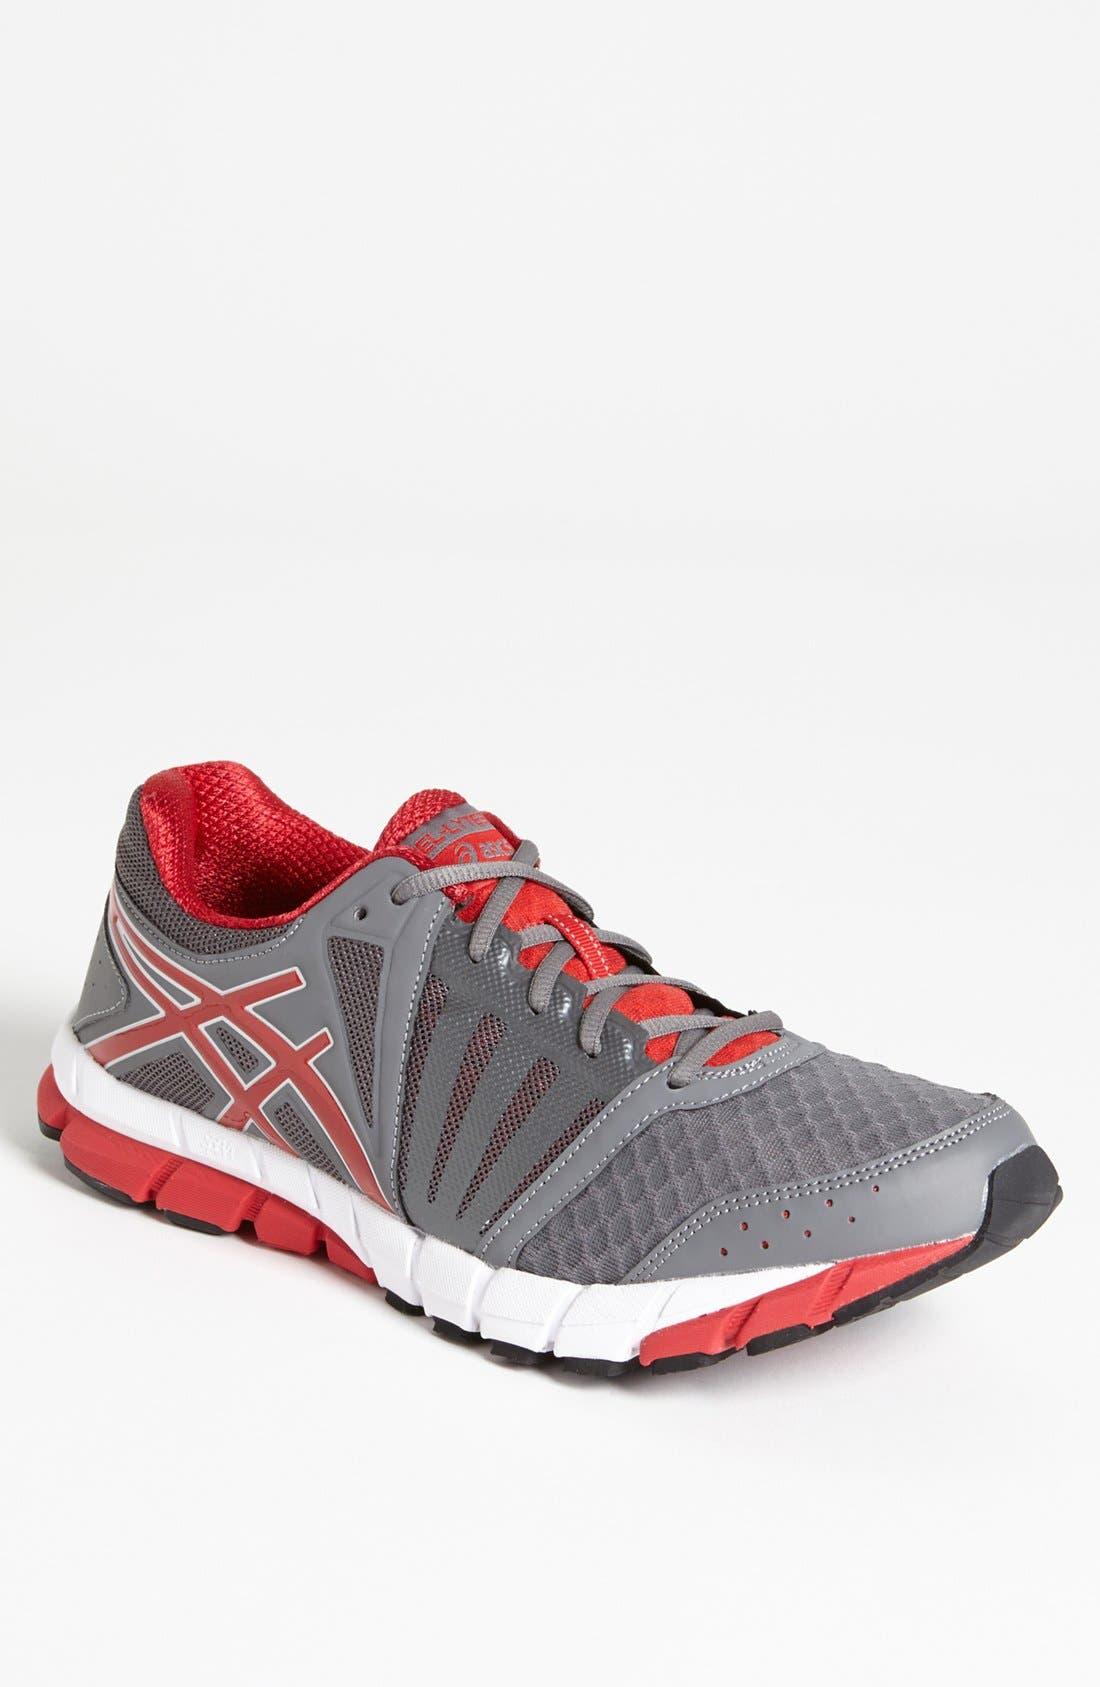 Main Image - ASICS 'GEL-Lyte 33 2.0' Running Shoe (Men)